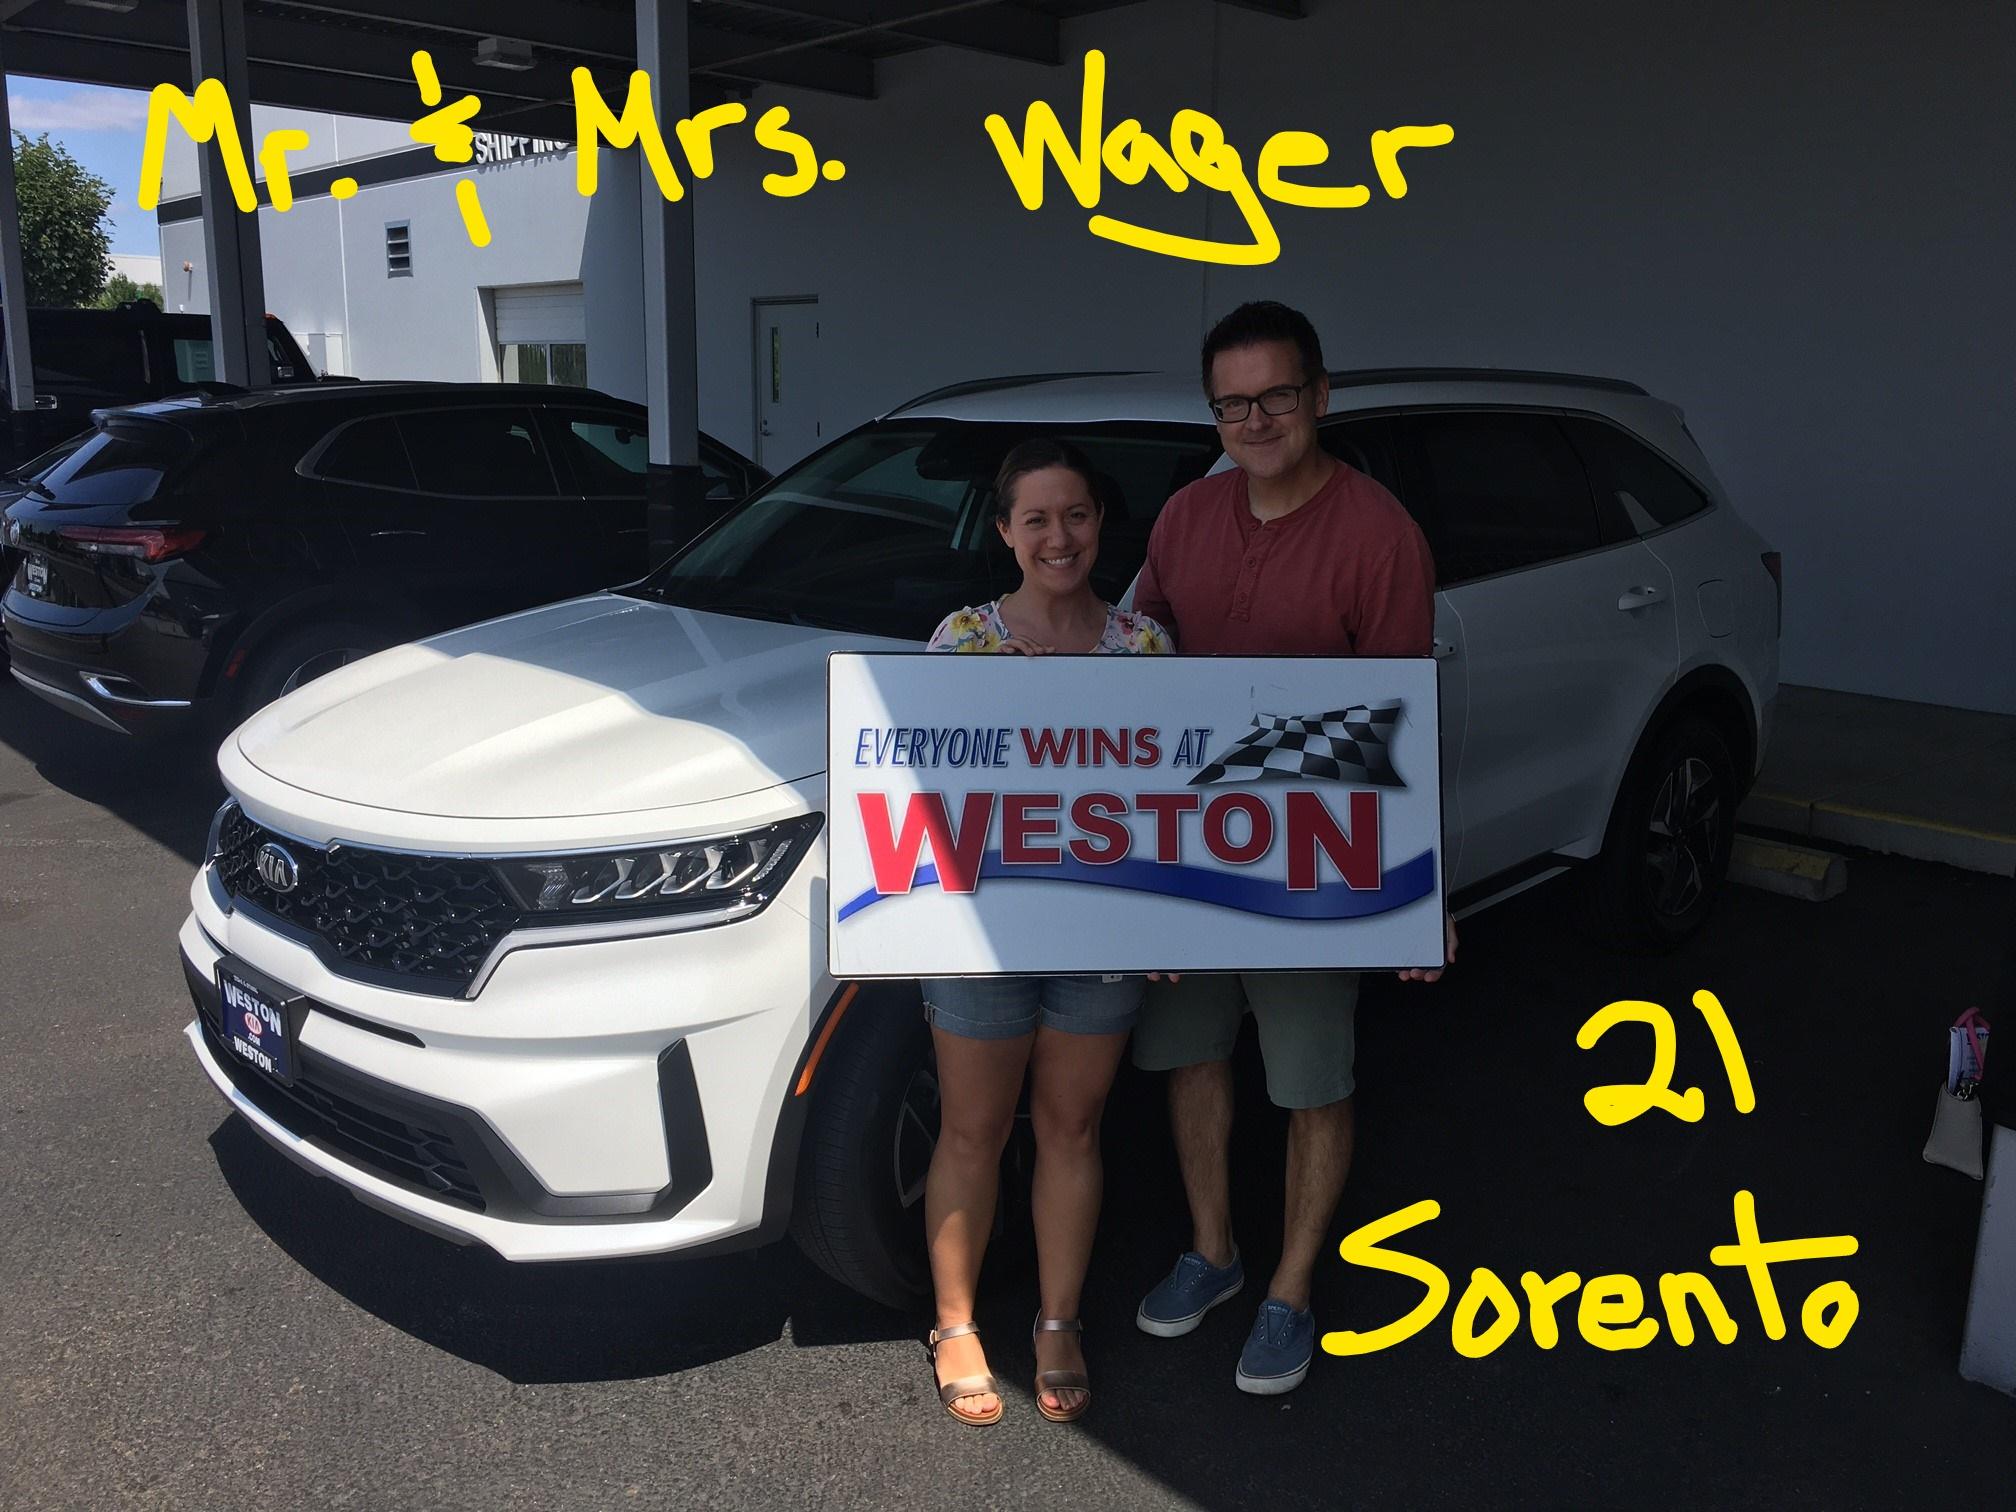 21 Sorento Mr & Mrs Wager